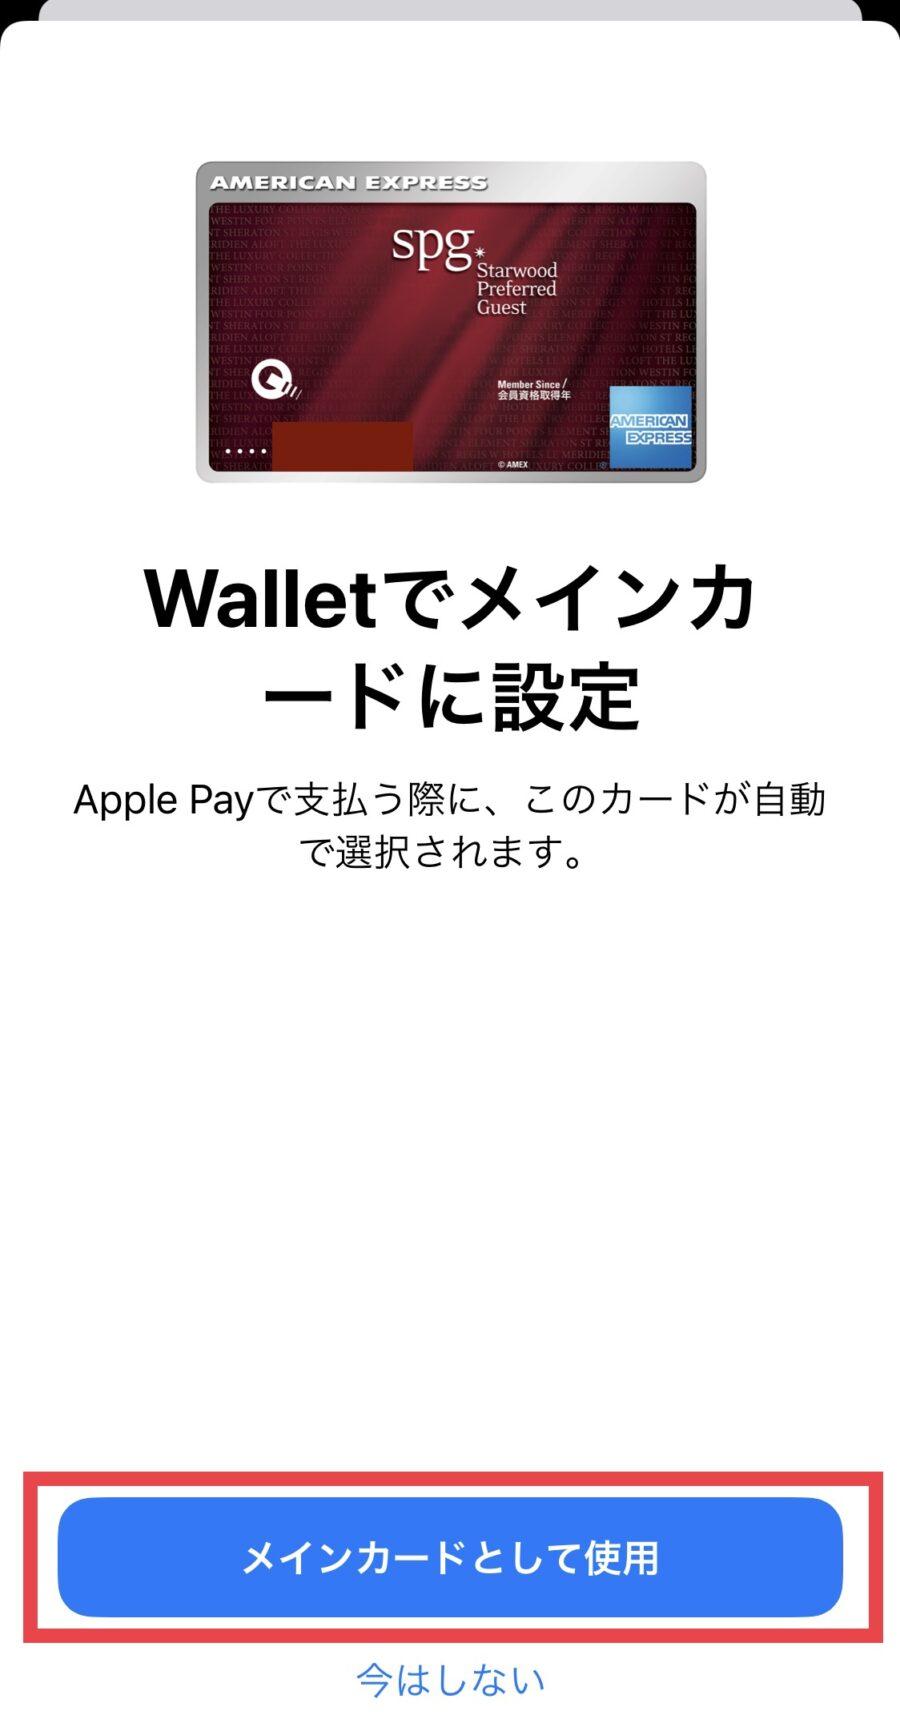 Apple Pay(Walletアプリ)のクレジットカード追加・変更方法8